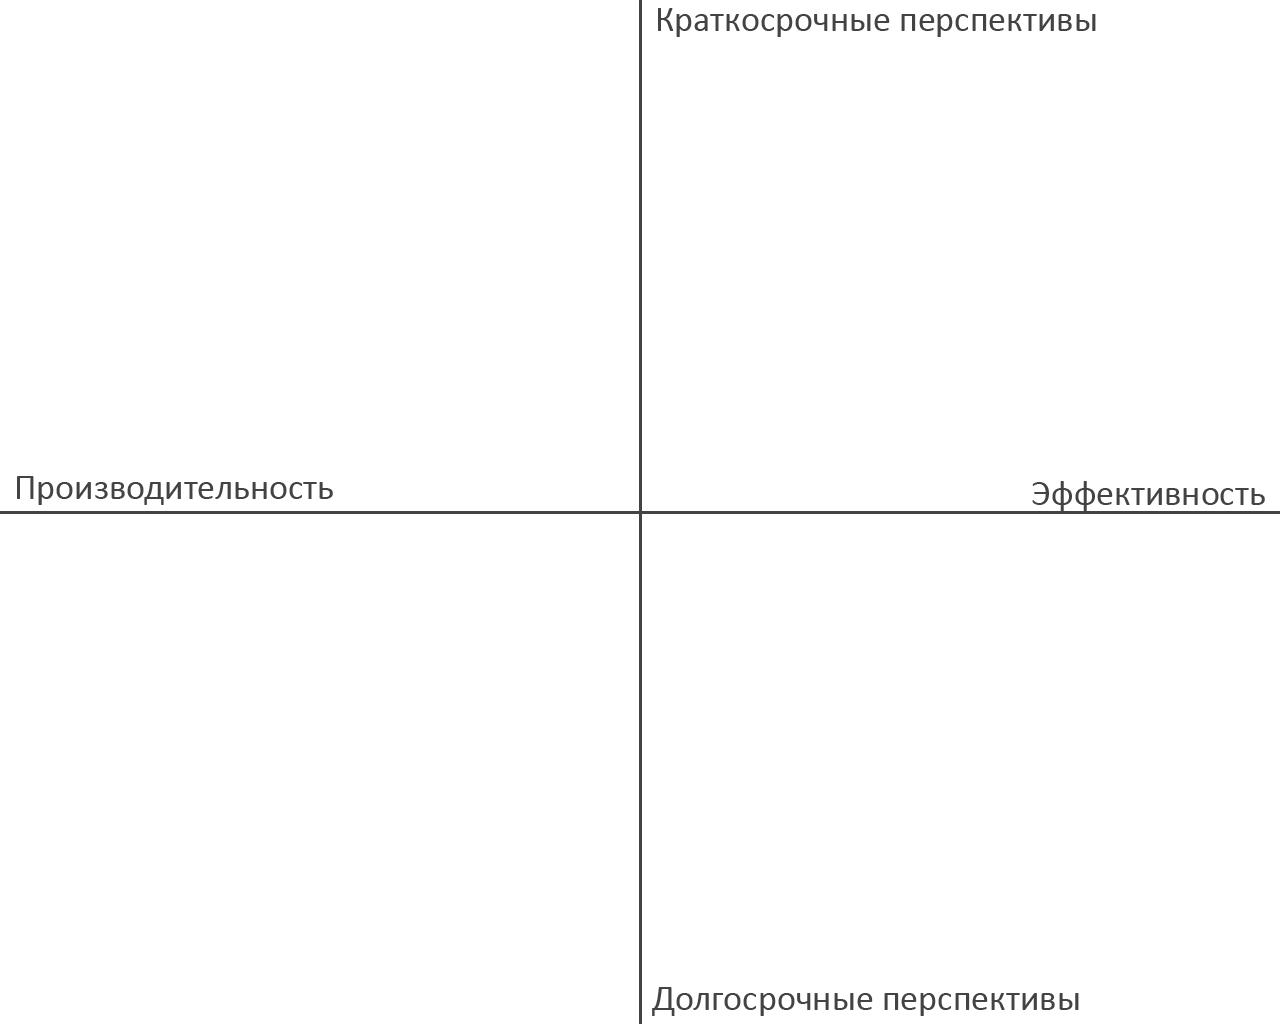 1-20219-7a05be.jpg